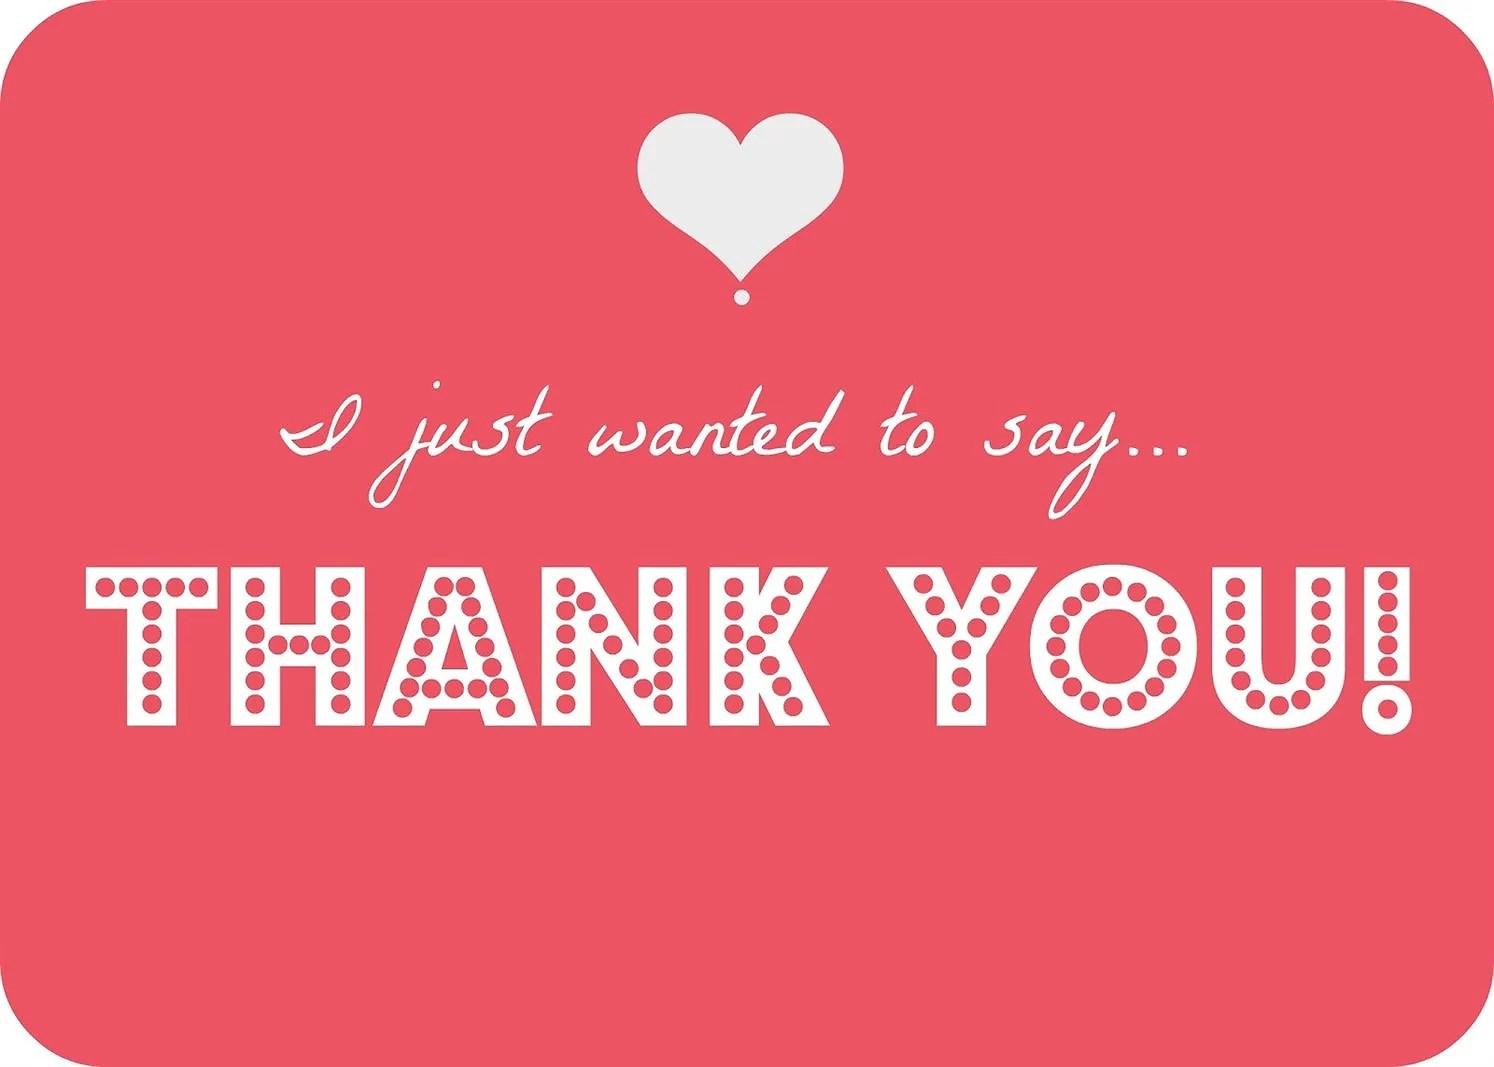 Sending out some gratitude